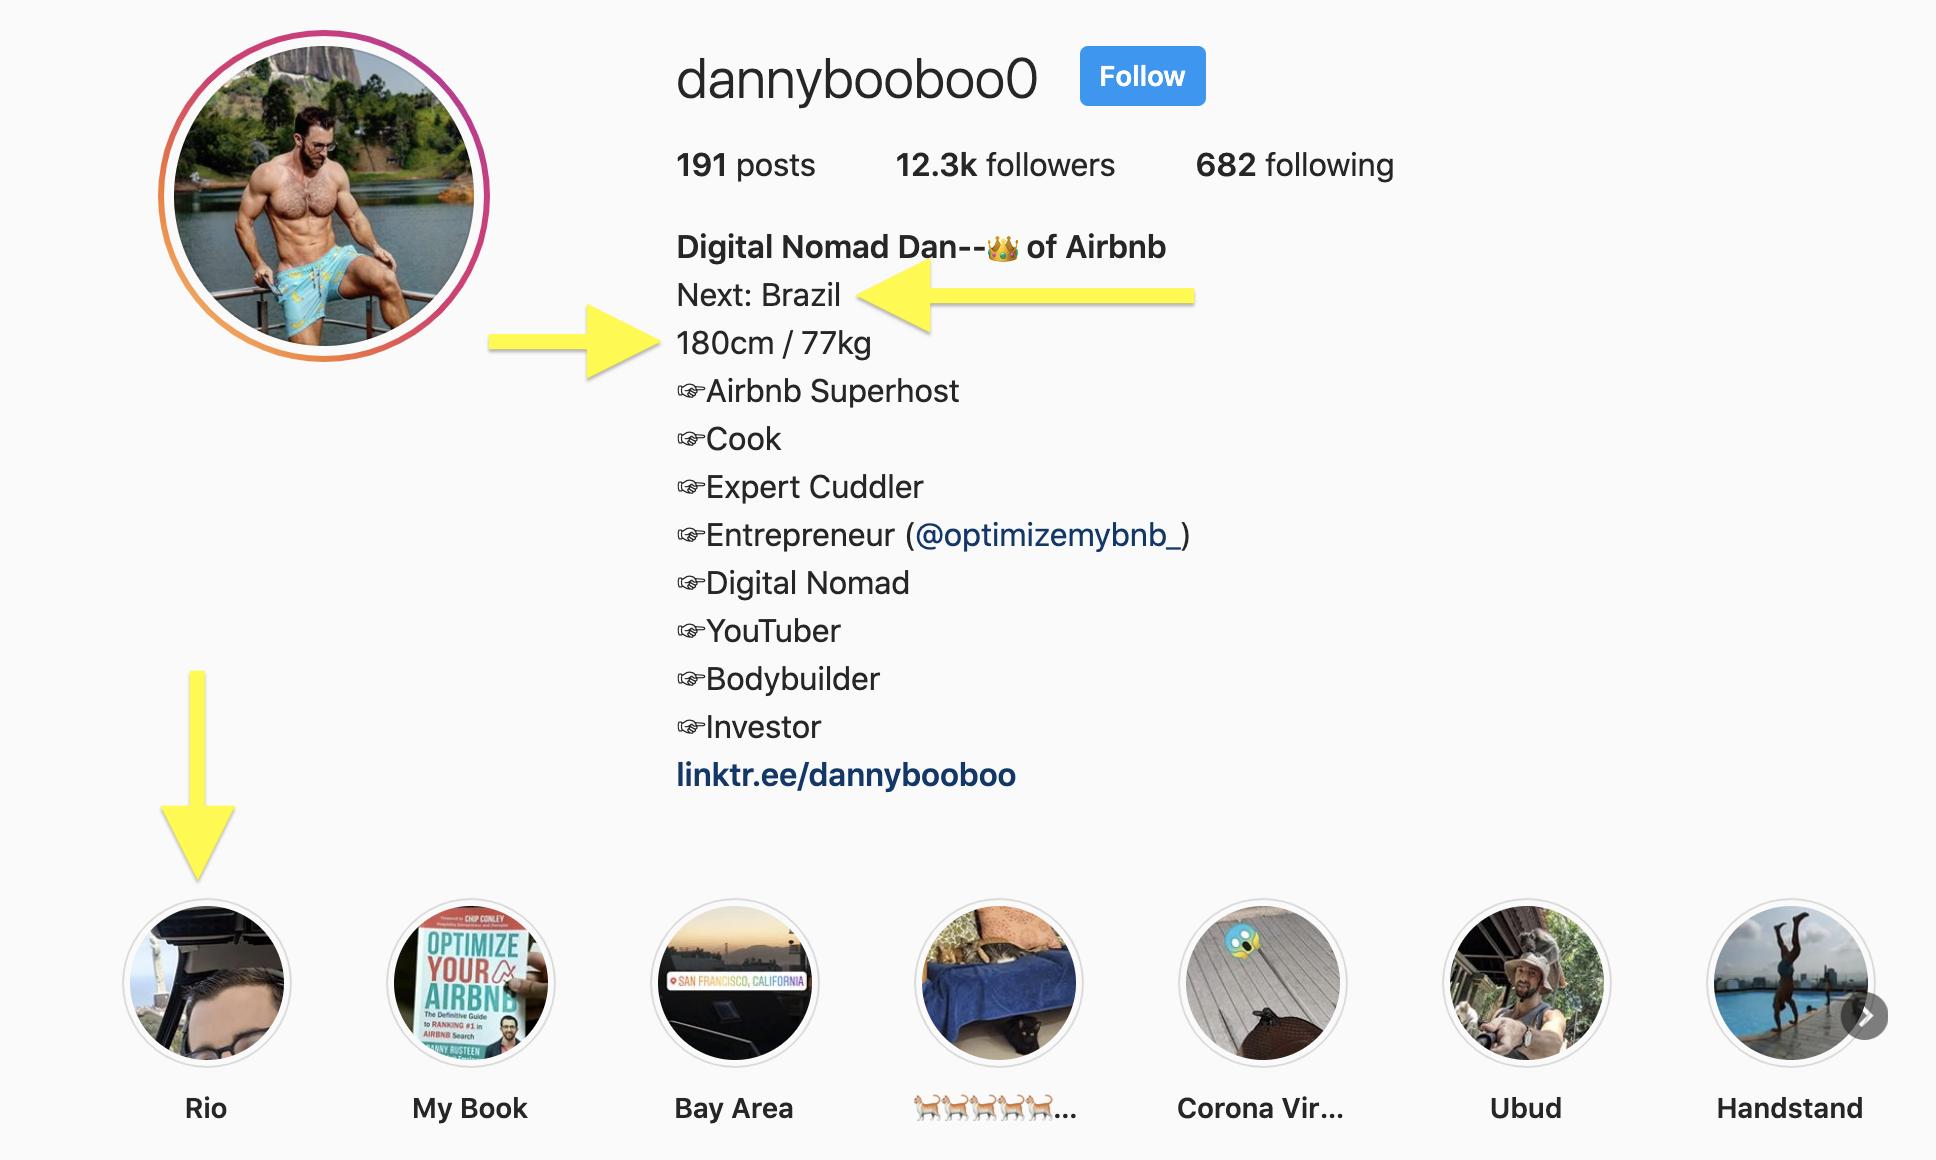 social sensei, dannybooboo instagram profile